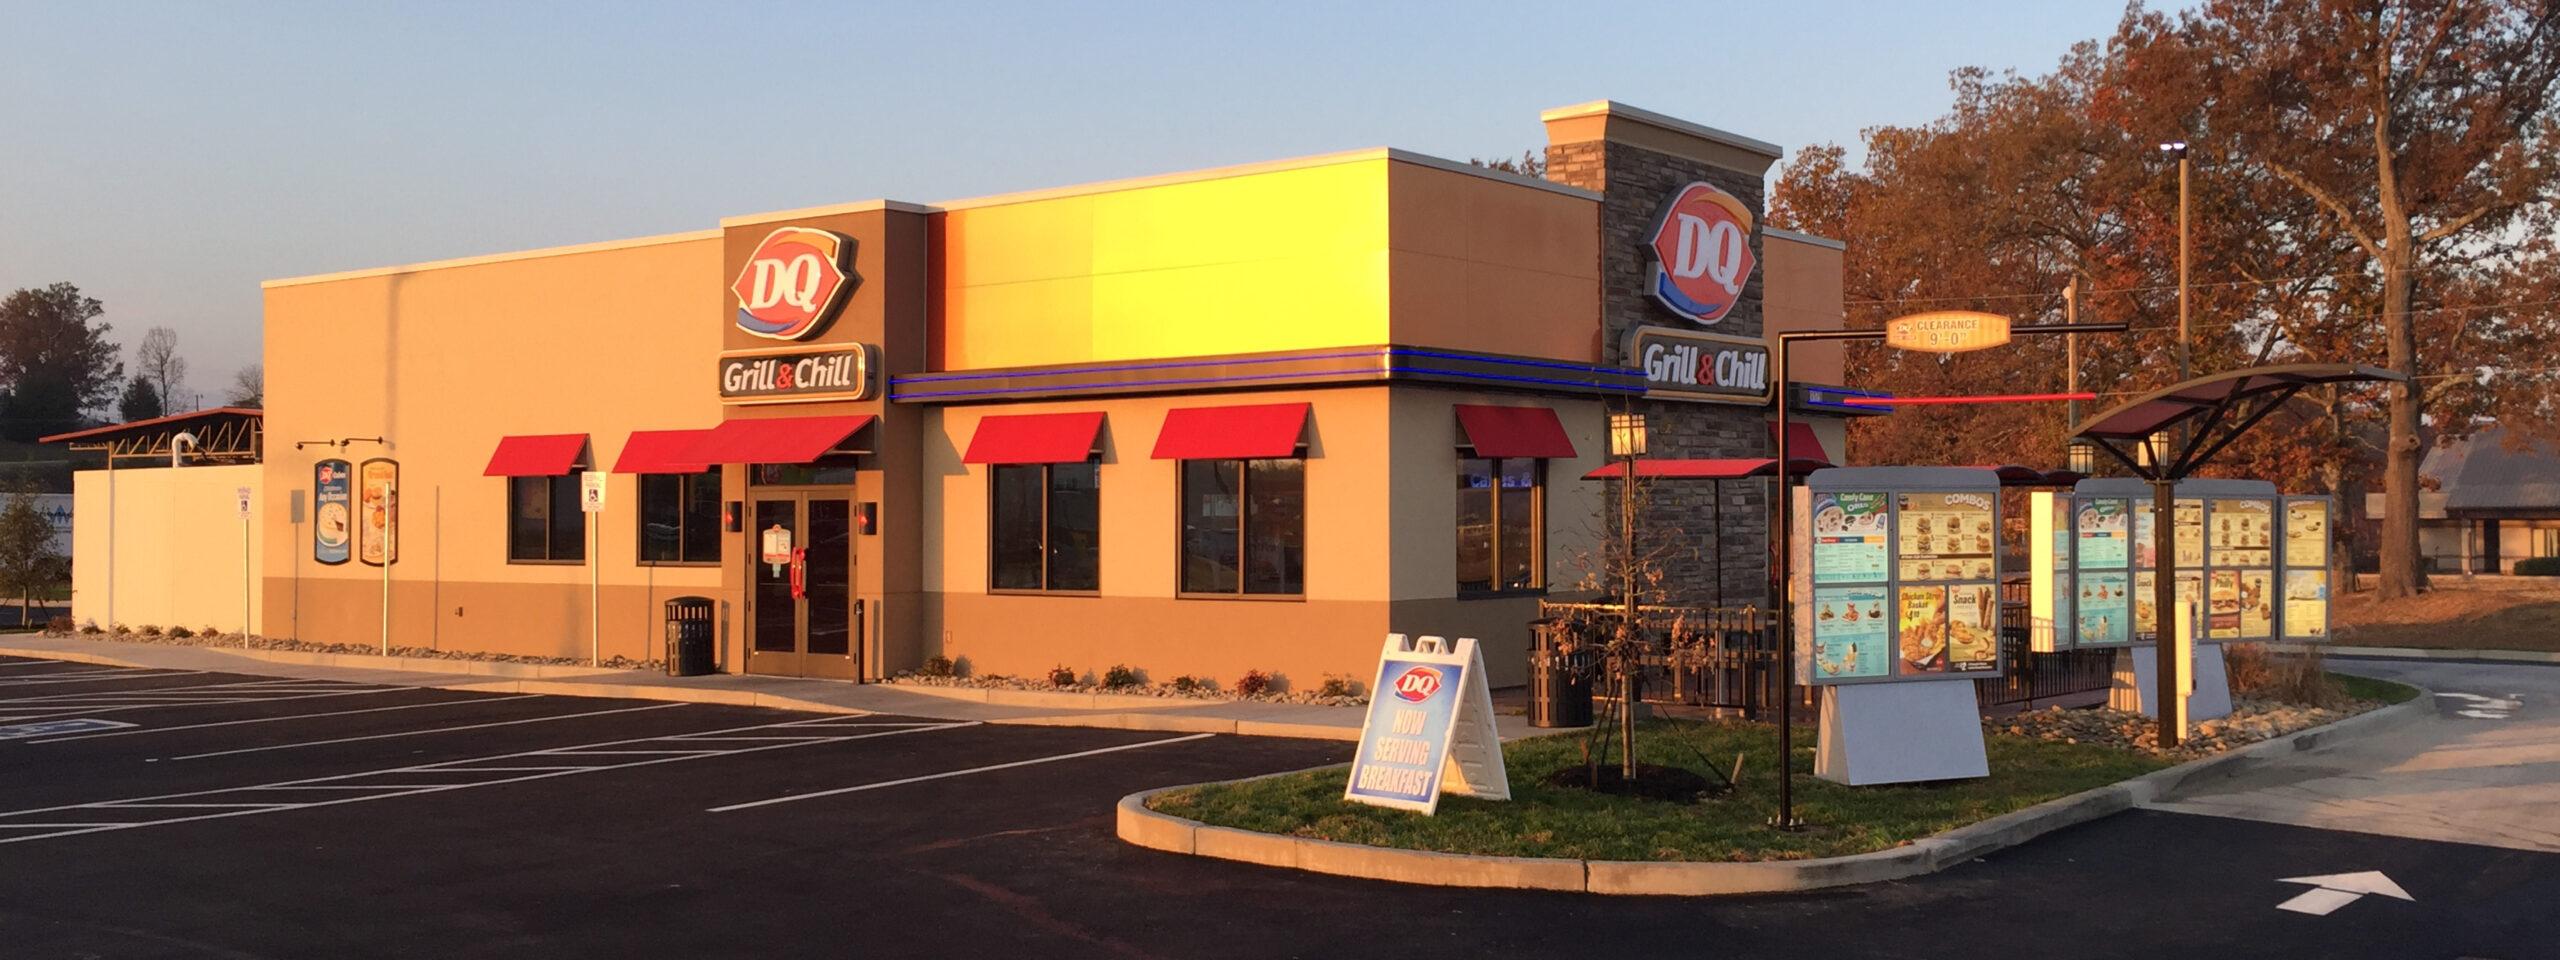 Sevierville, TN Fourteen Foods DQ Restaurant